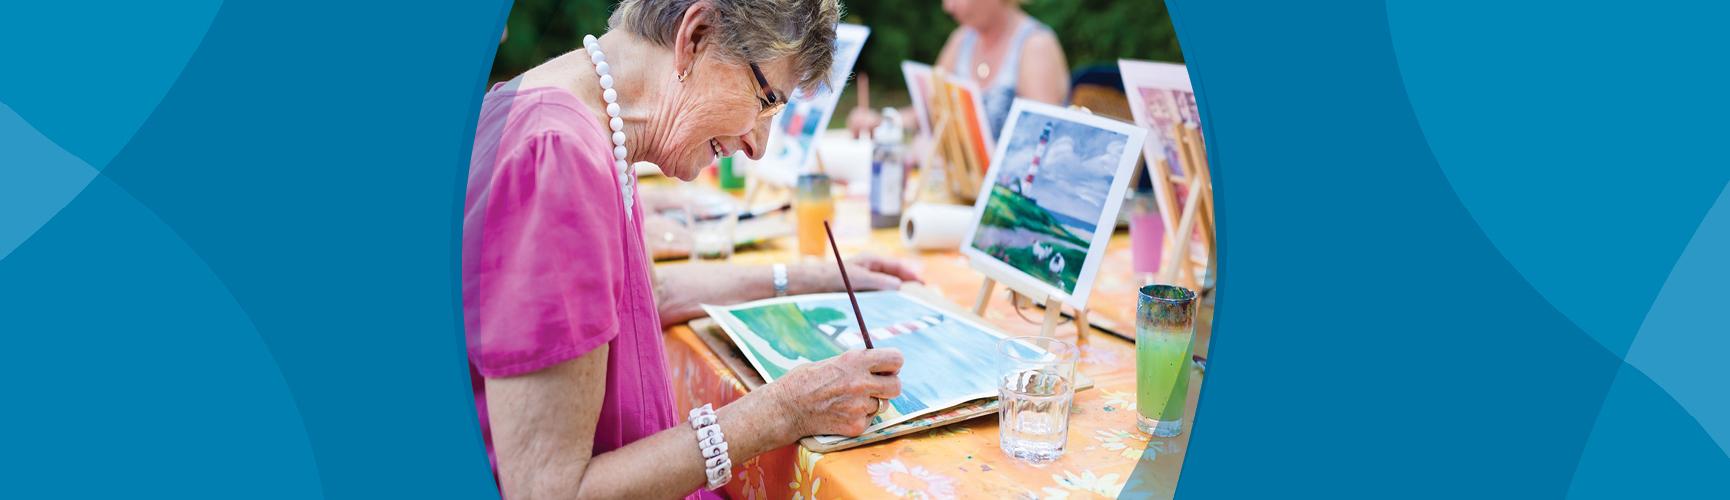 Community-arts based program SmArt aging